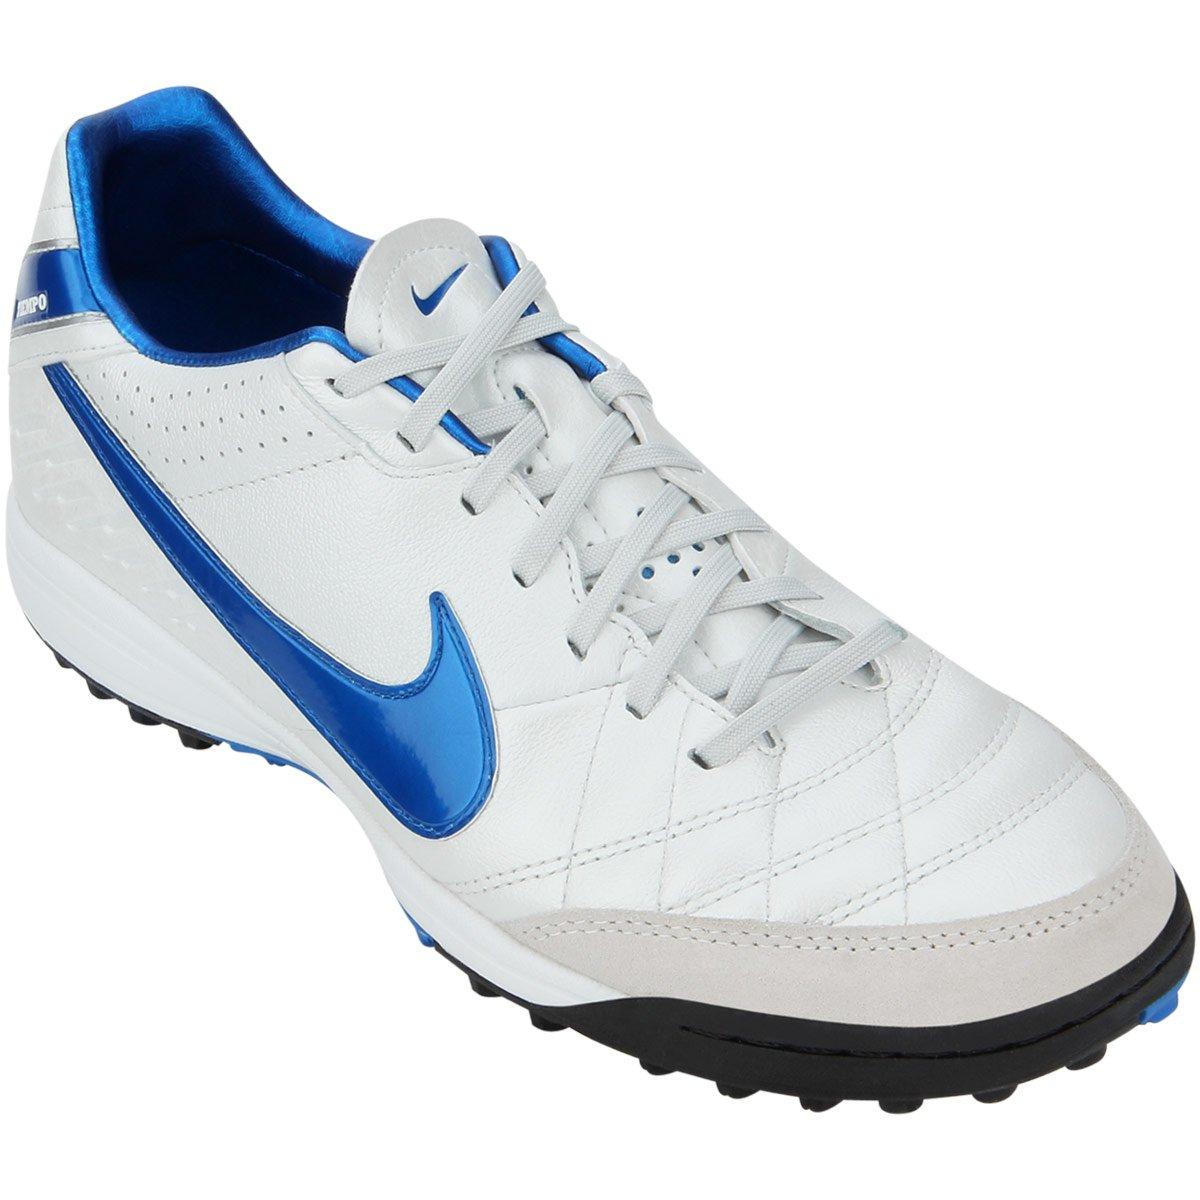 22ec6adbae Chuteira Nike Tiempo Mystic 4 TF - Compre Agora